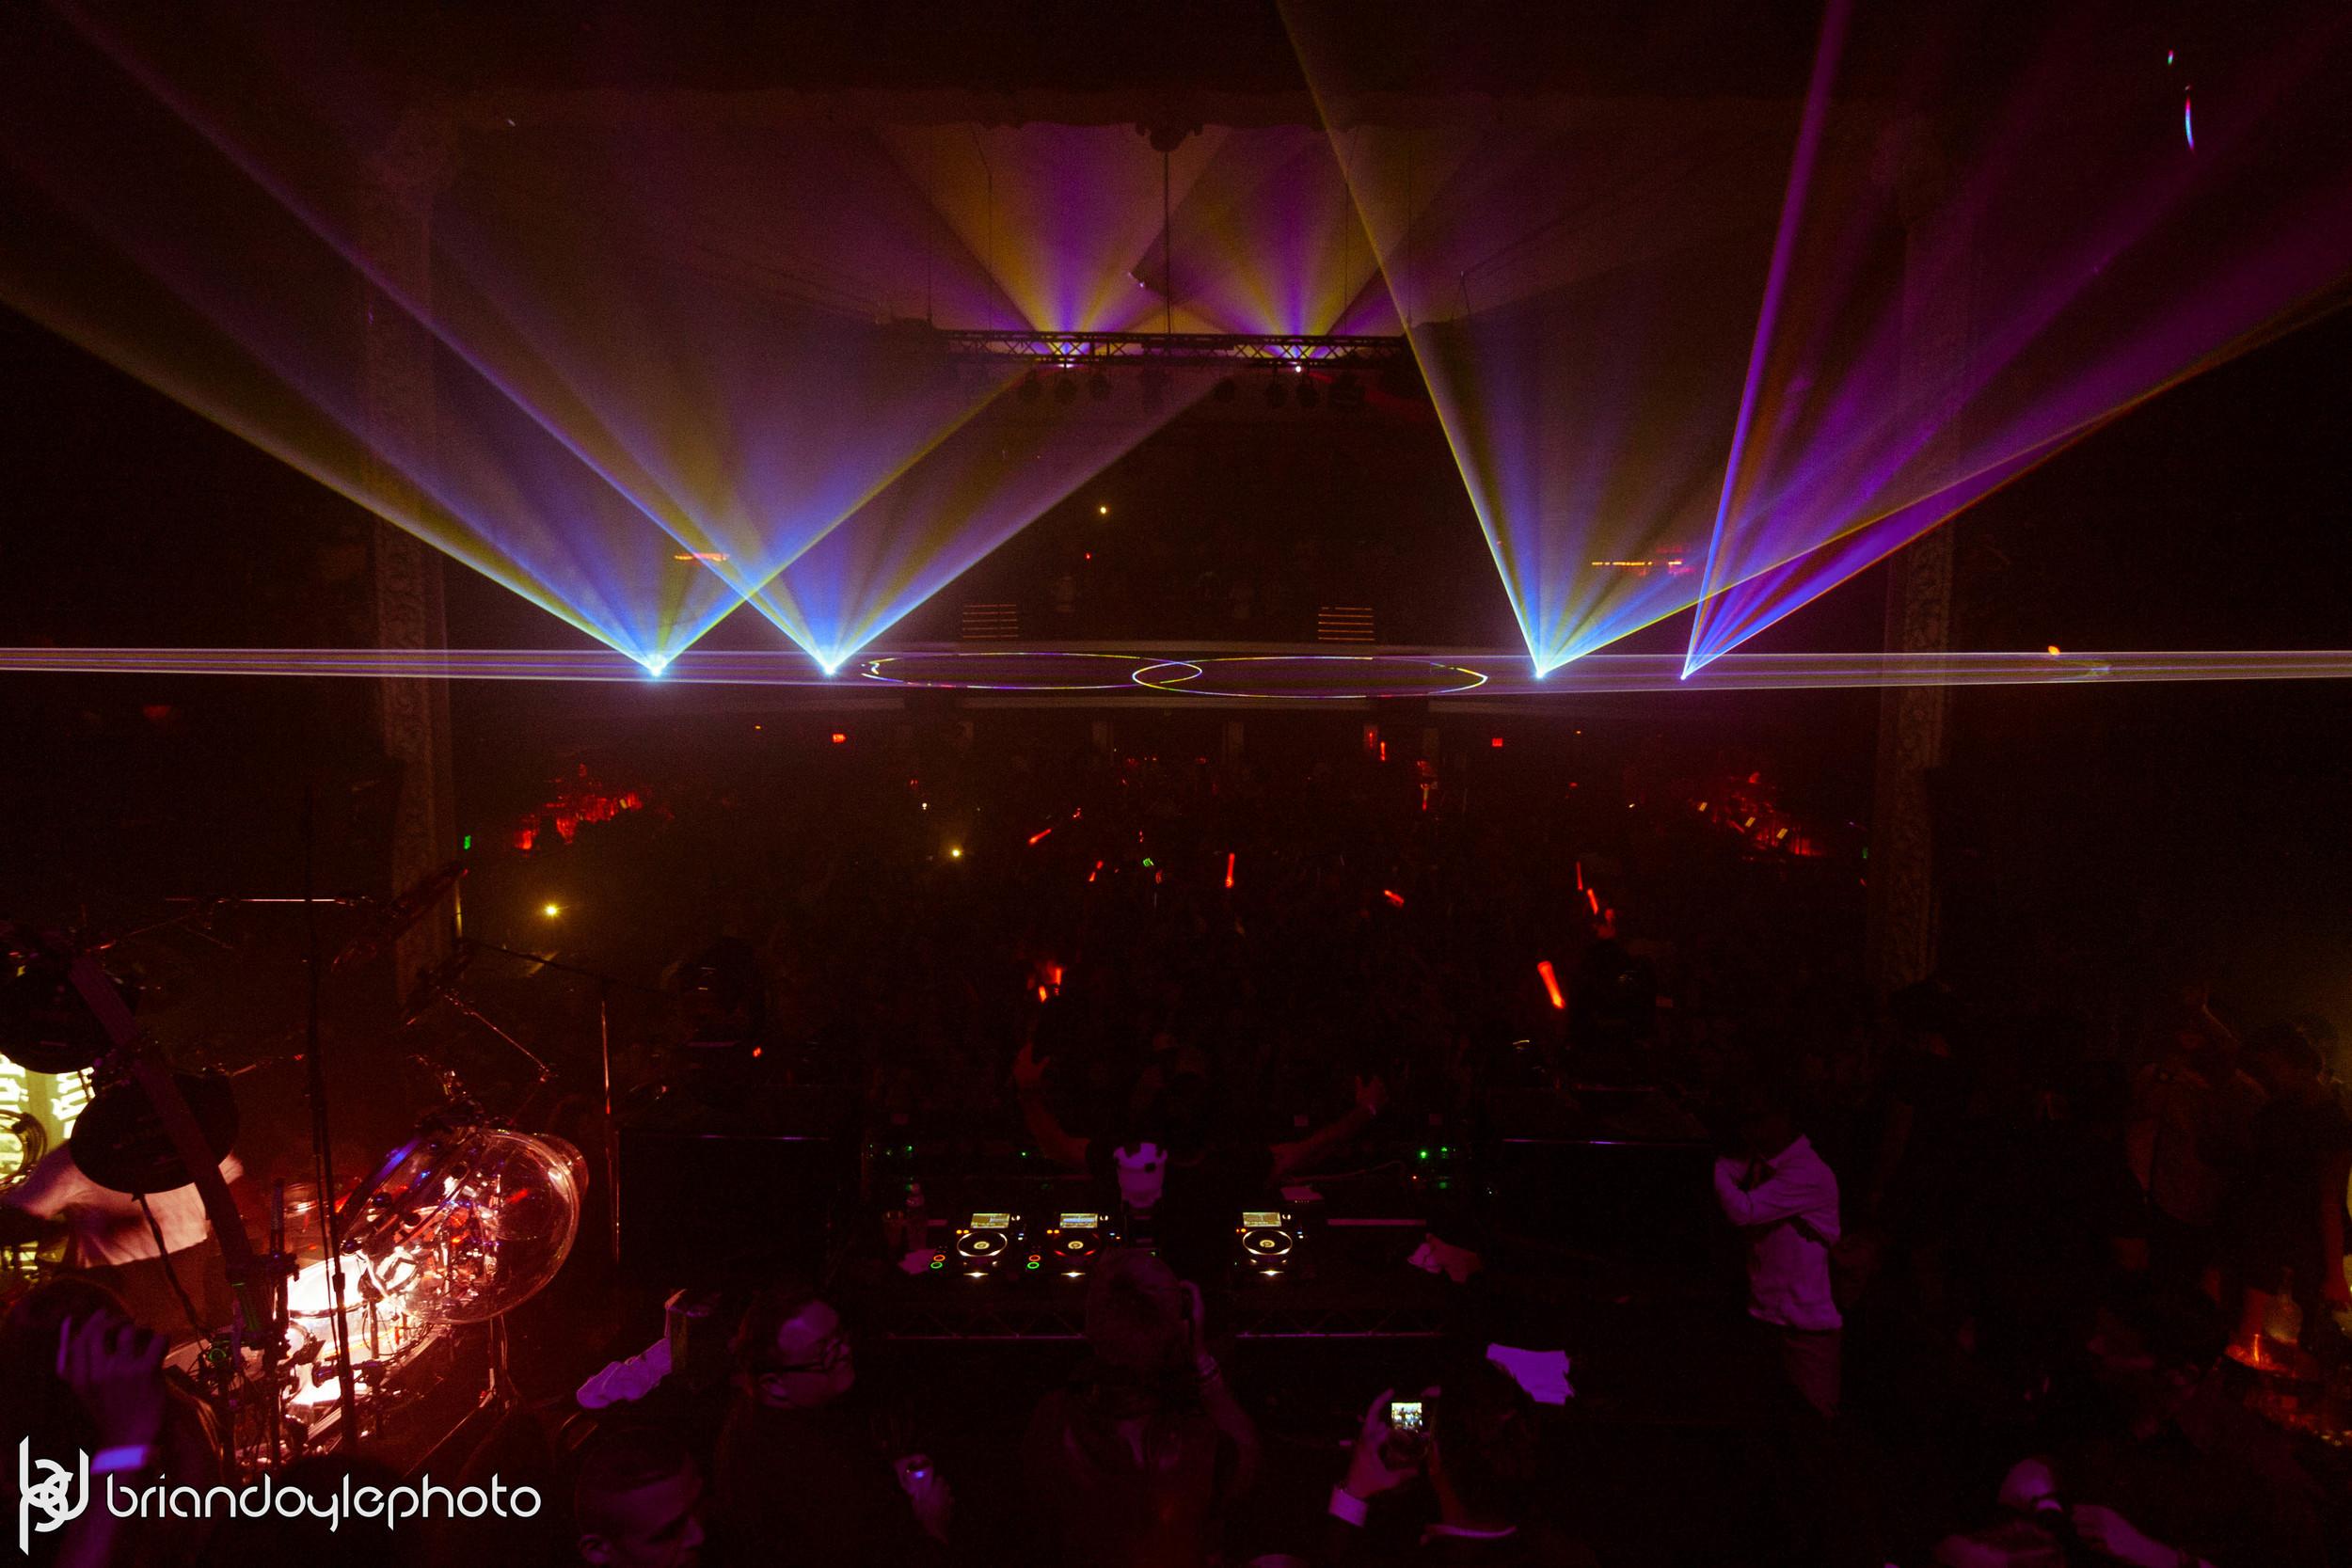 Jagermeister Presents - Paul Oakenfold @ Avalon bdp 27.09.14-34.jpg